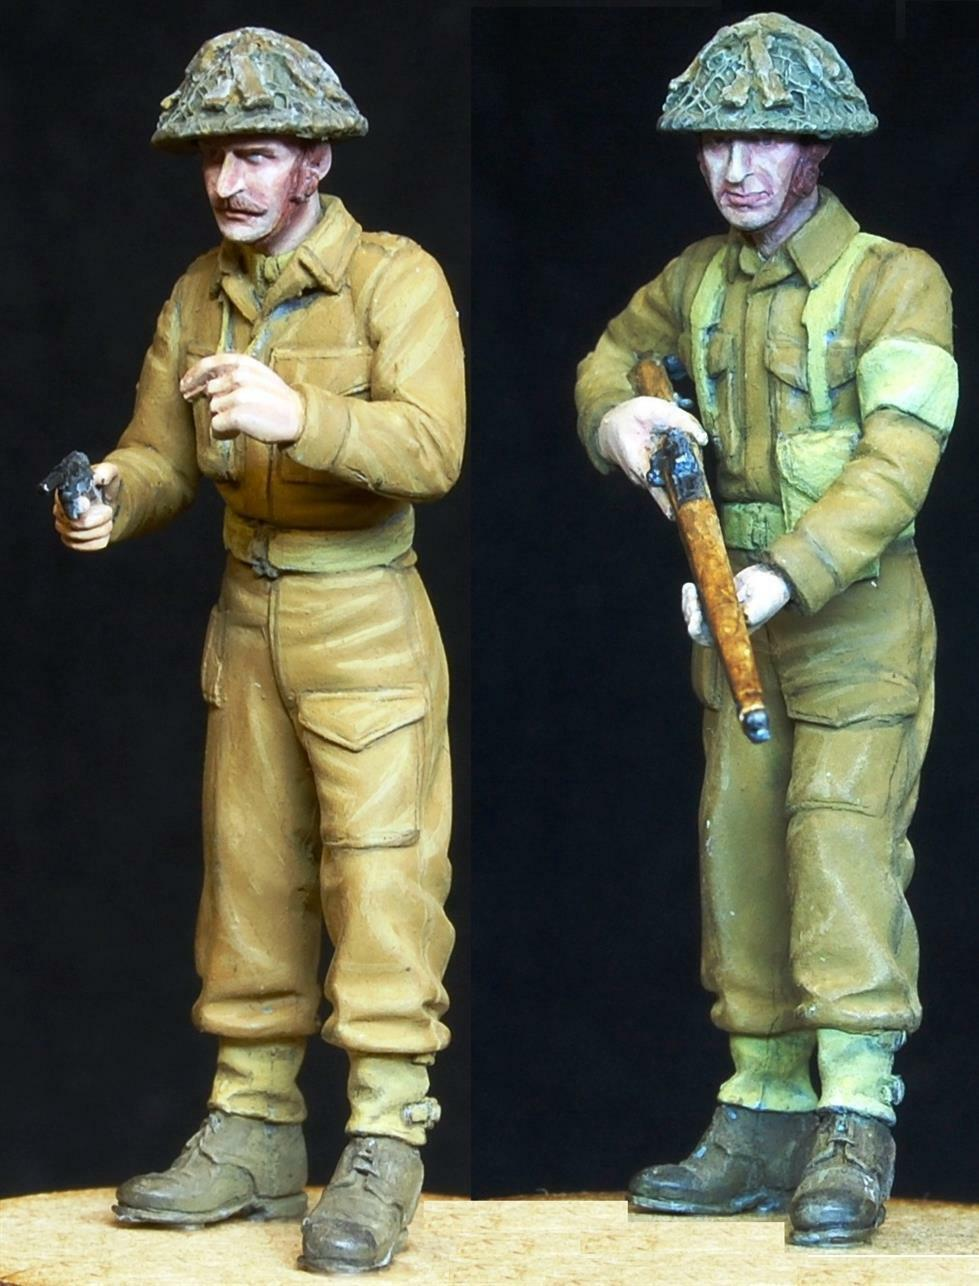 1 35 Escala Resina Modelismo Kit Ww2 Británico Home Guard Patrol (2 Figuras)